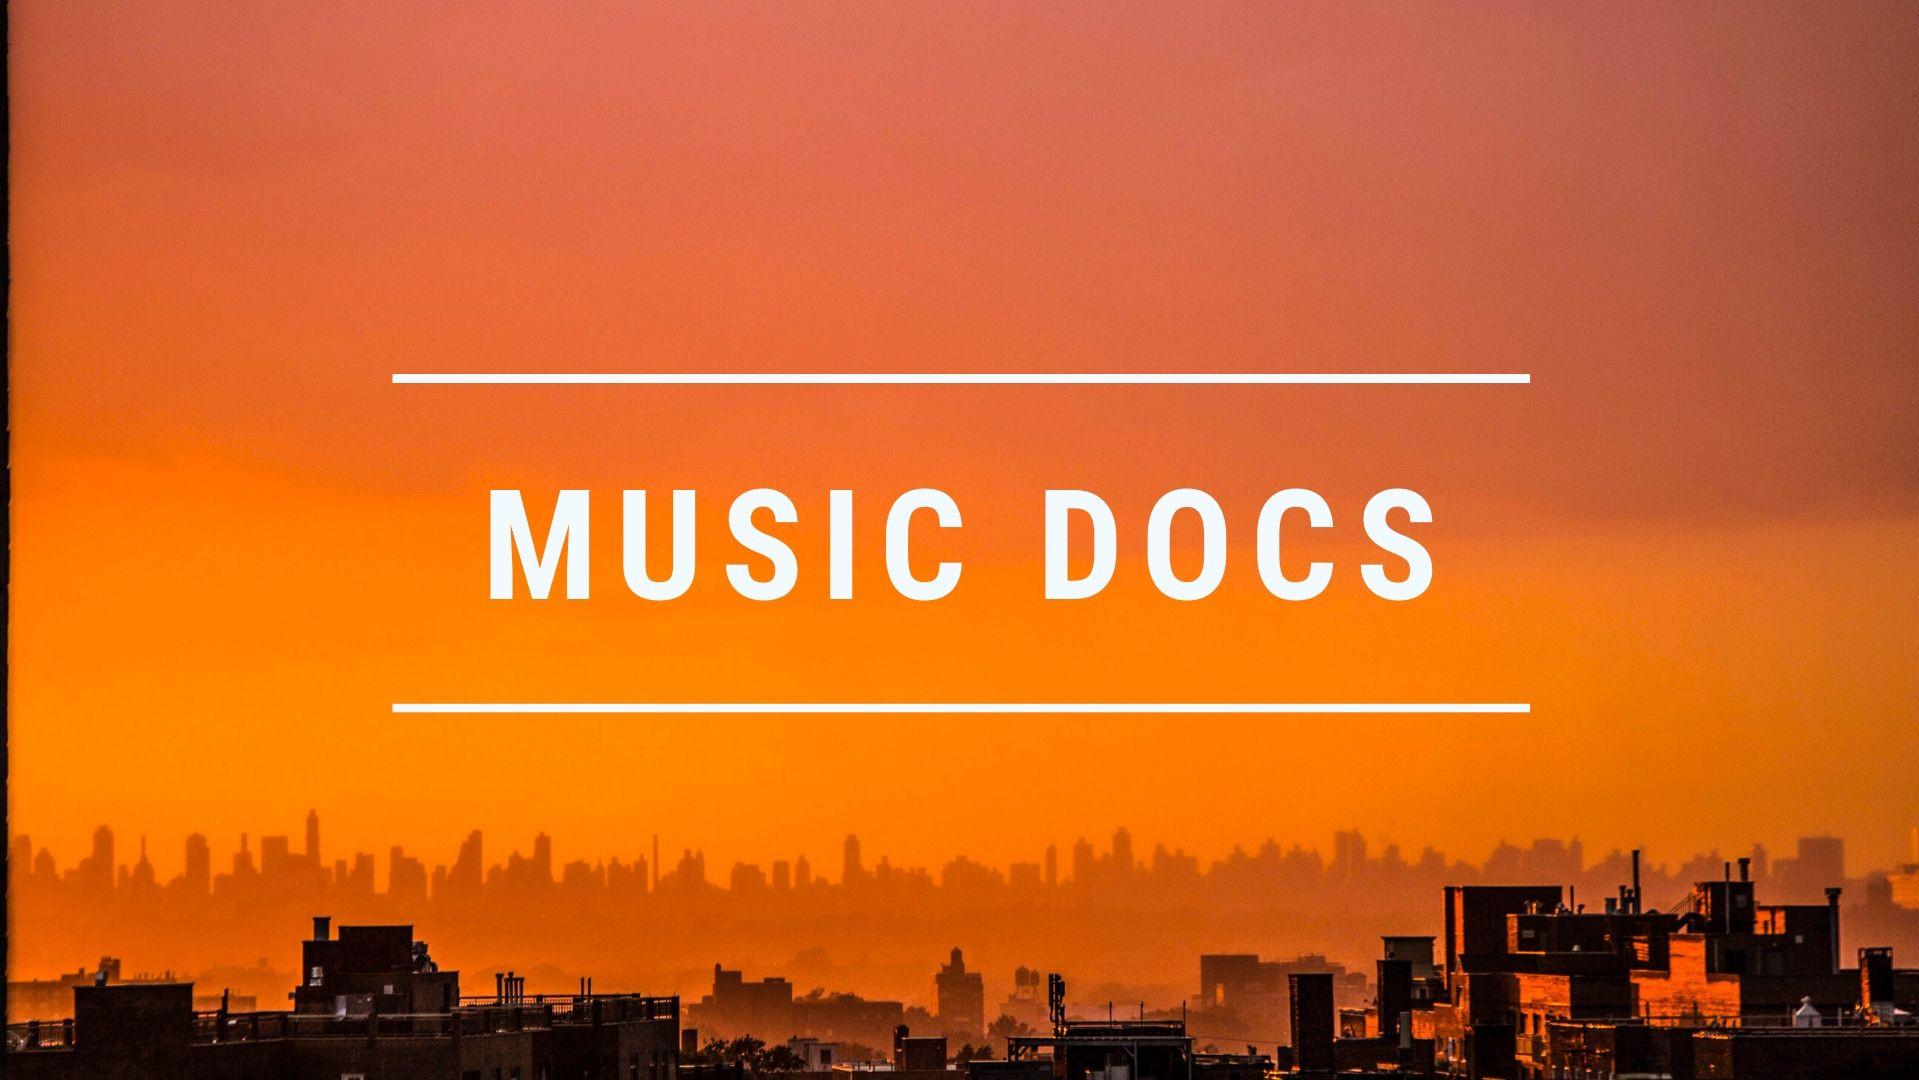 Music Docs